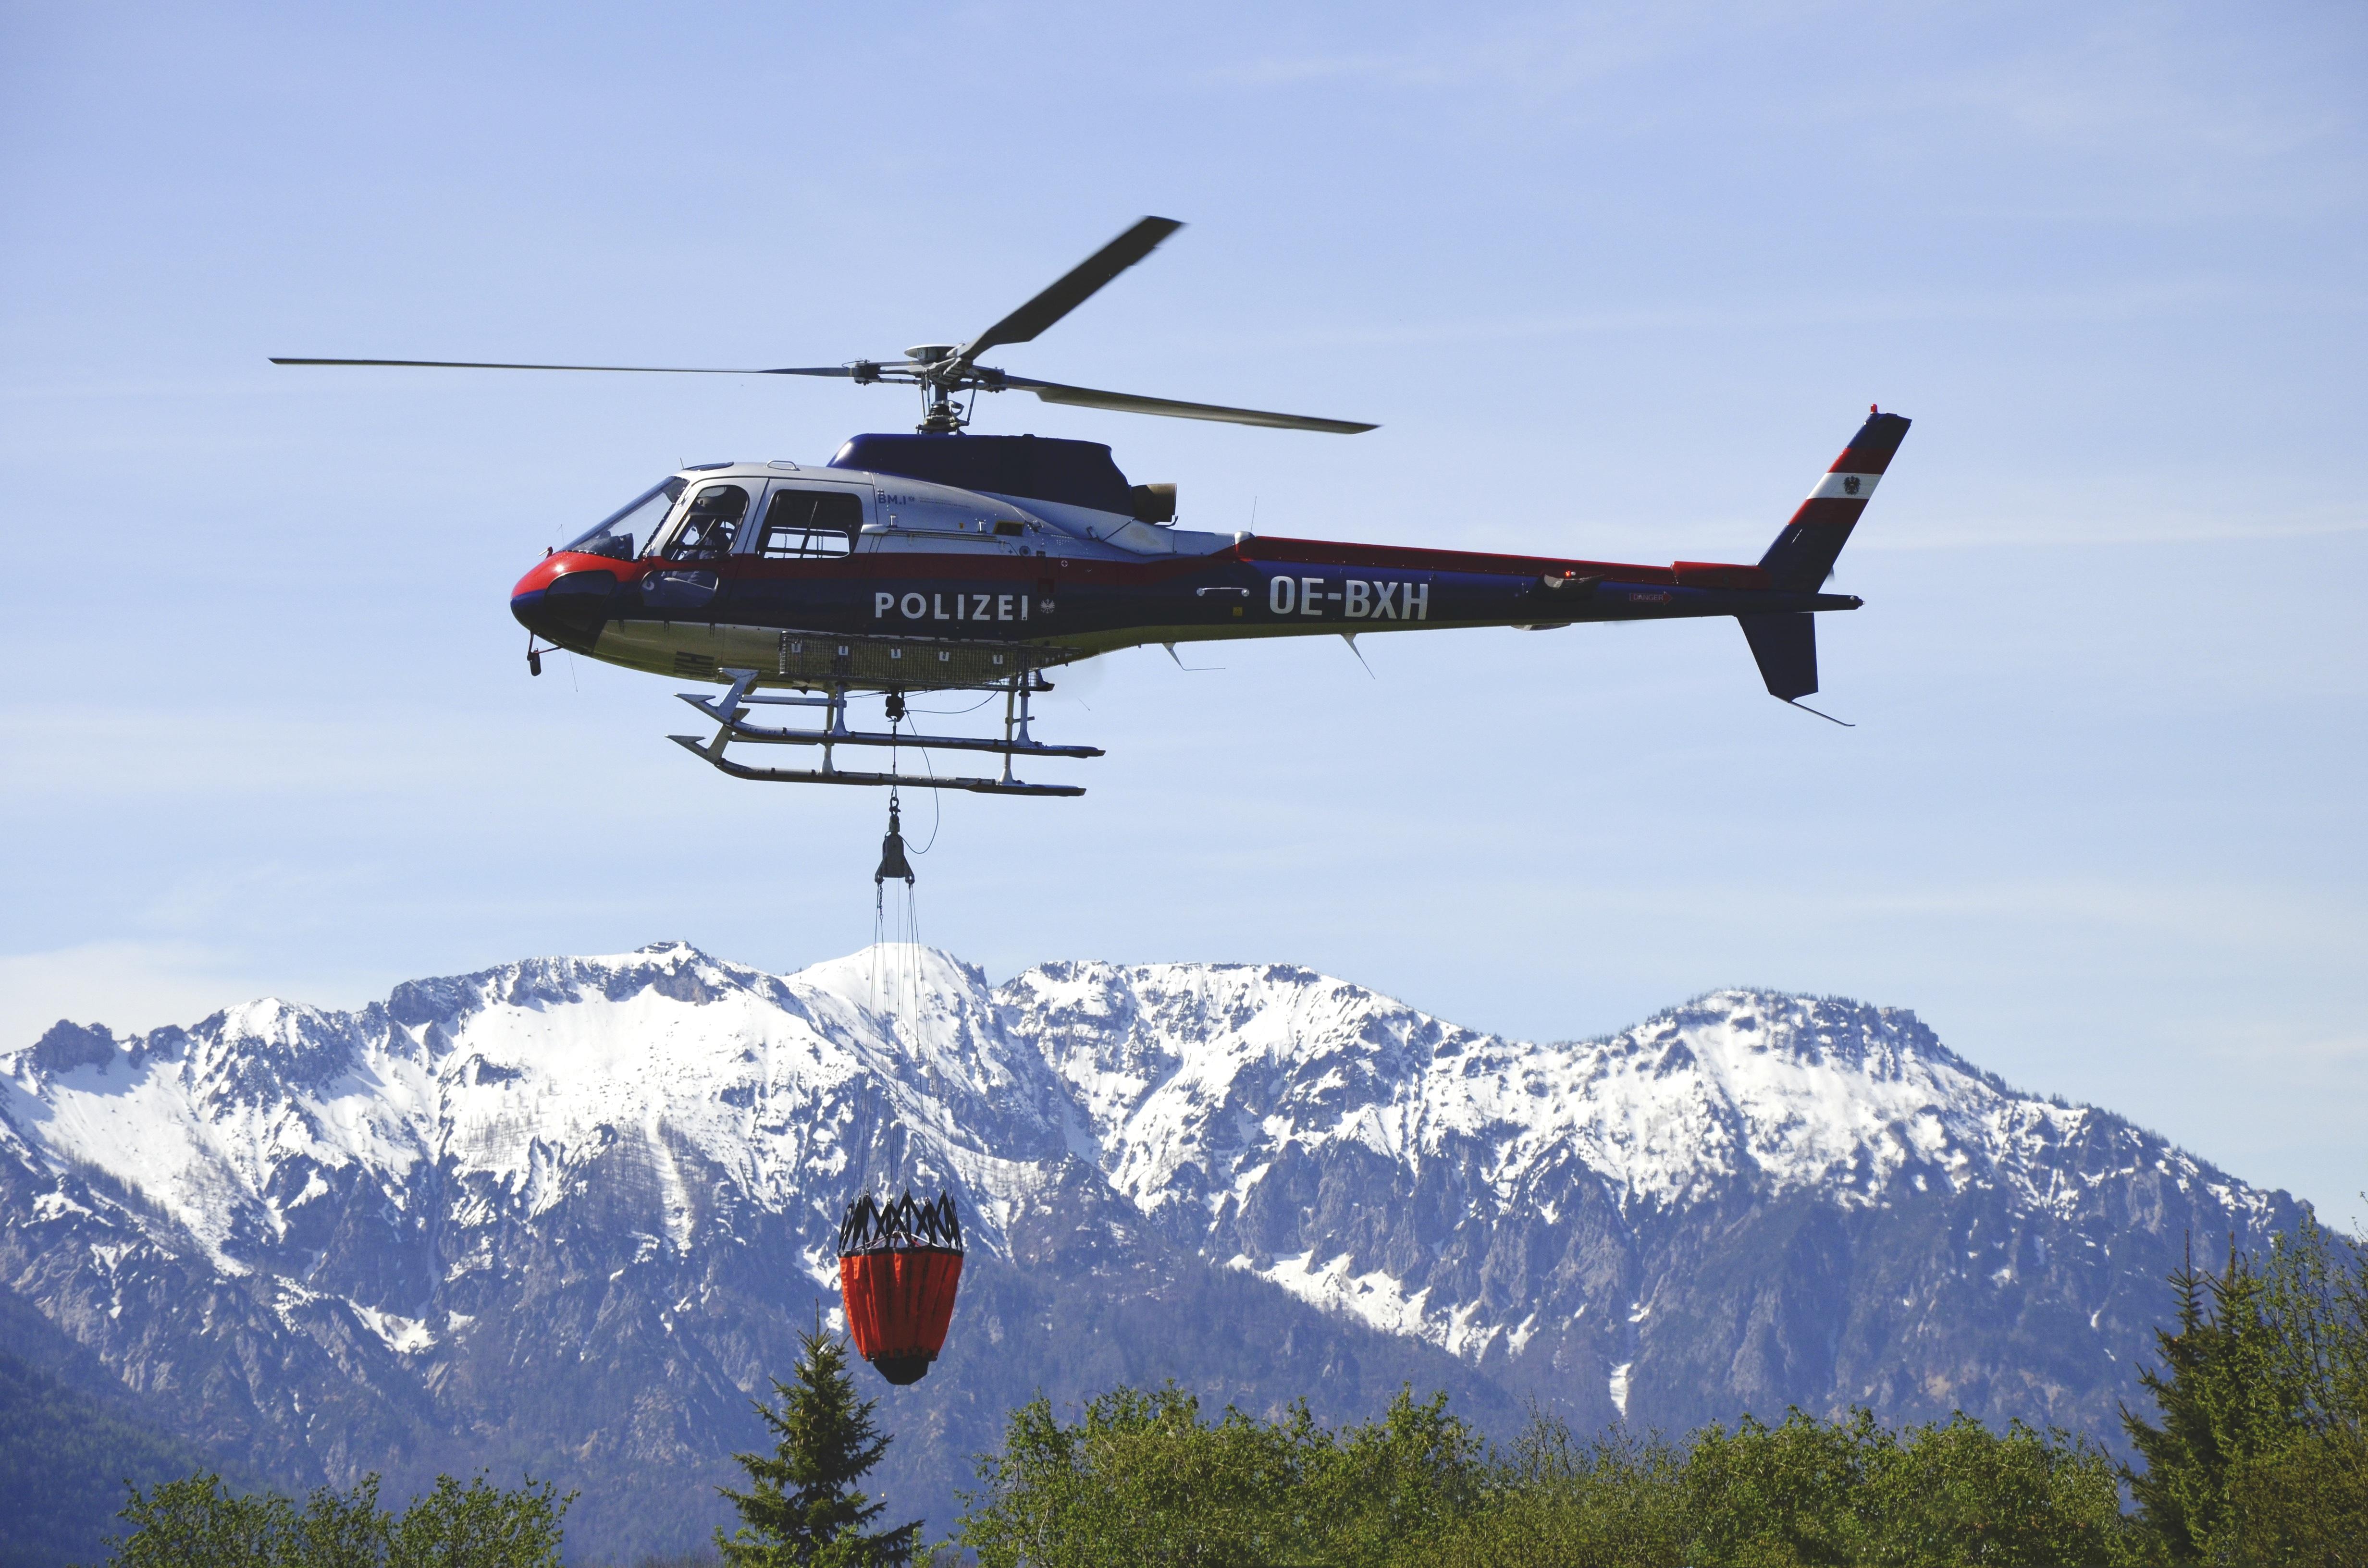 The Range Helicopter on fire range, crj 200 range, bomb range, learjet range, aircraft range,